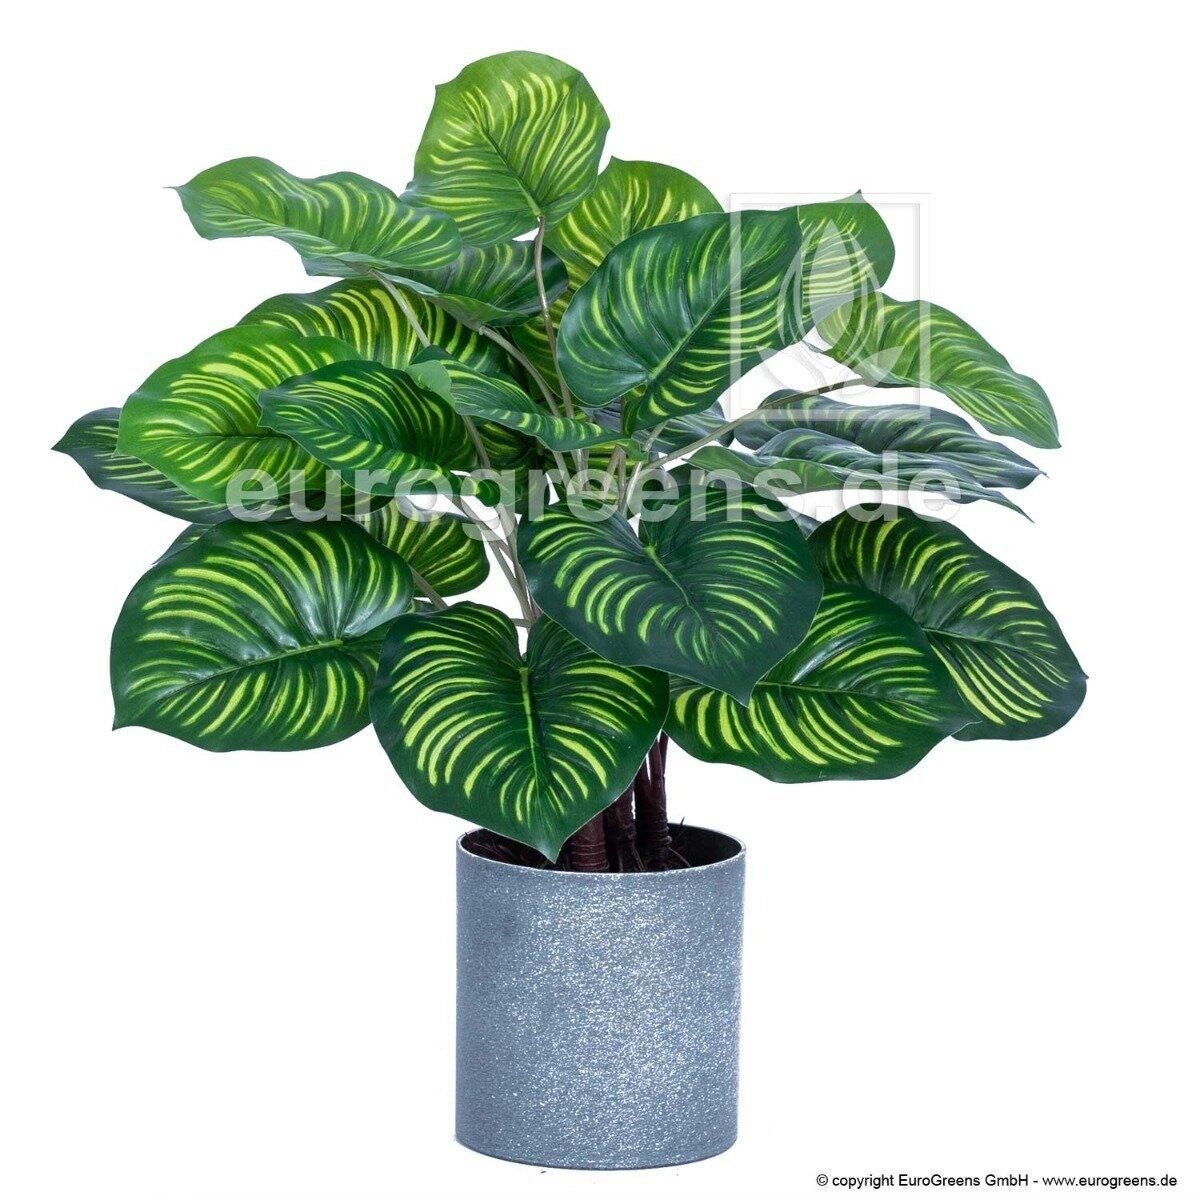 Umelá rastlina Kaládium 45 cm